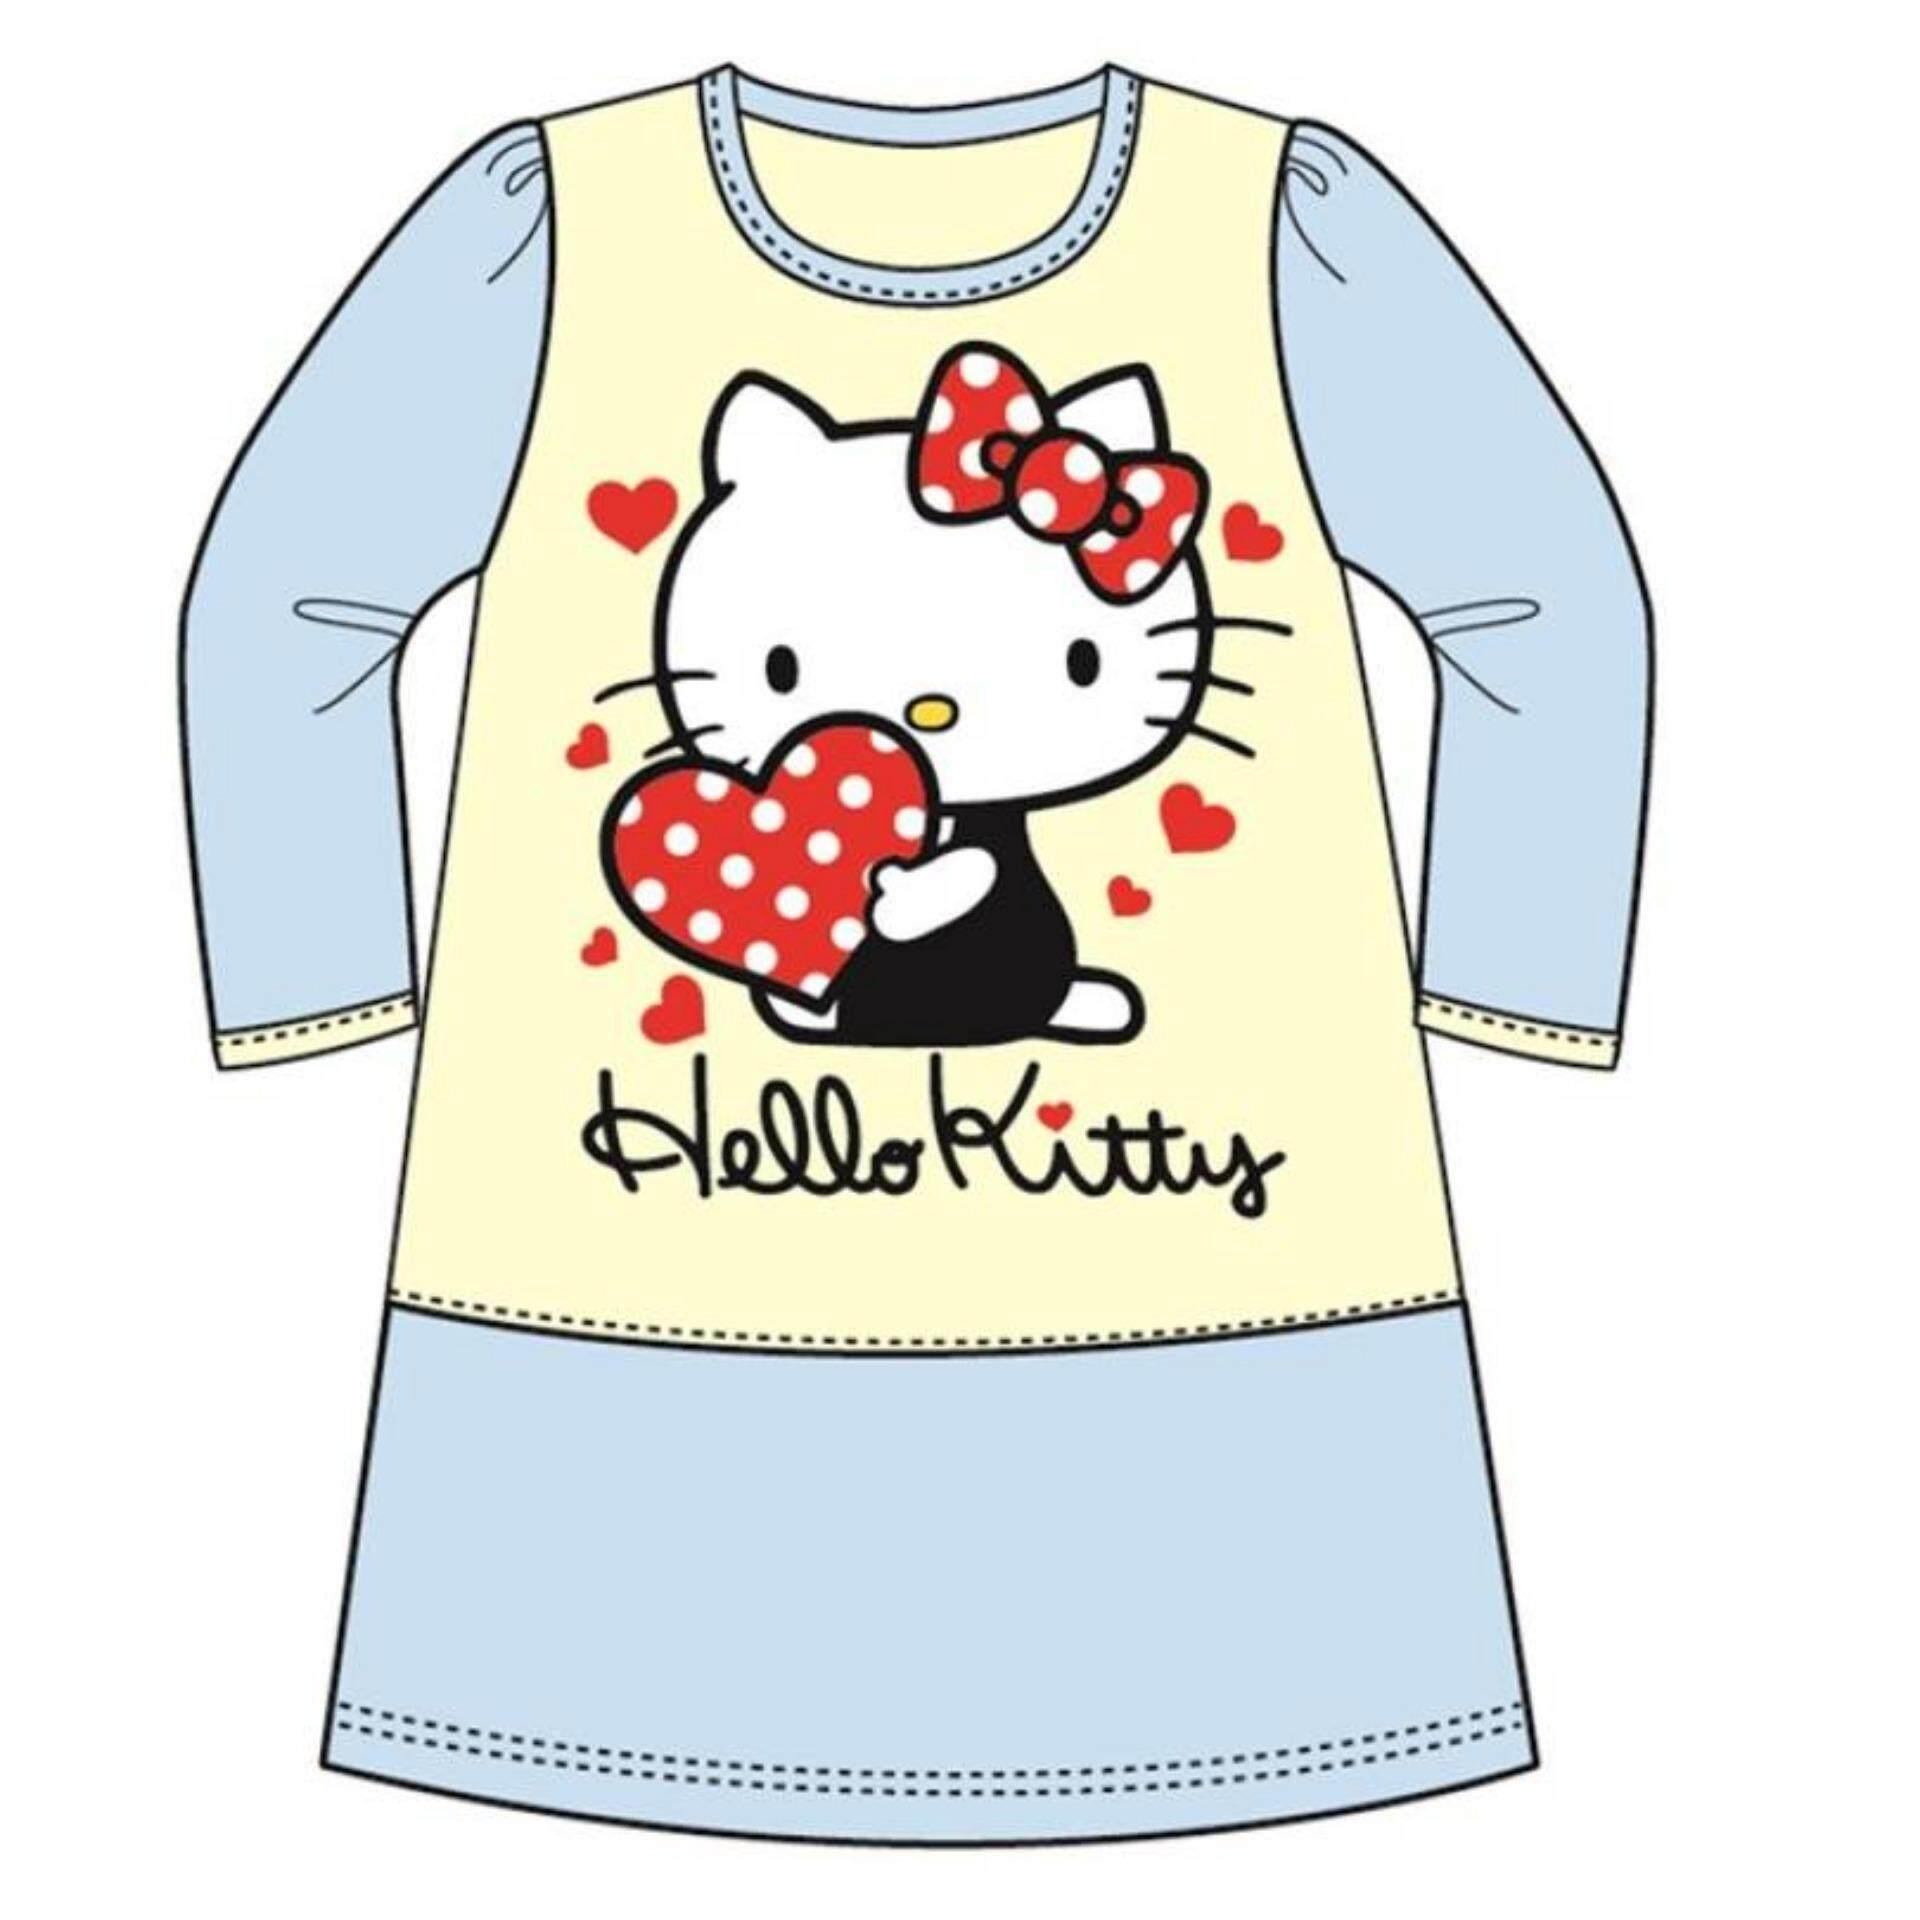 ea2168e911621 Sanrio Hello Kitty Casual Dress 100% Cotton 4yrs to 12yrs - Blue Colour